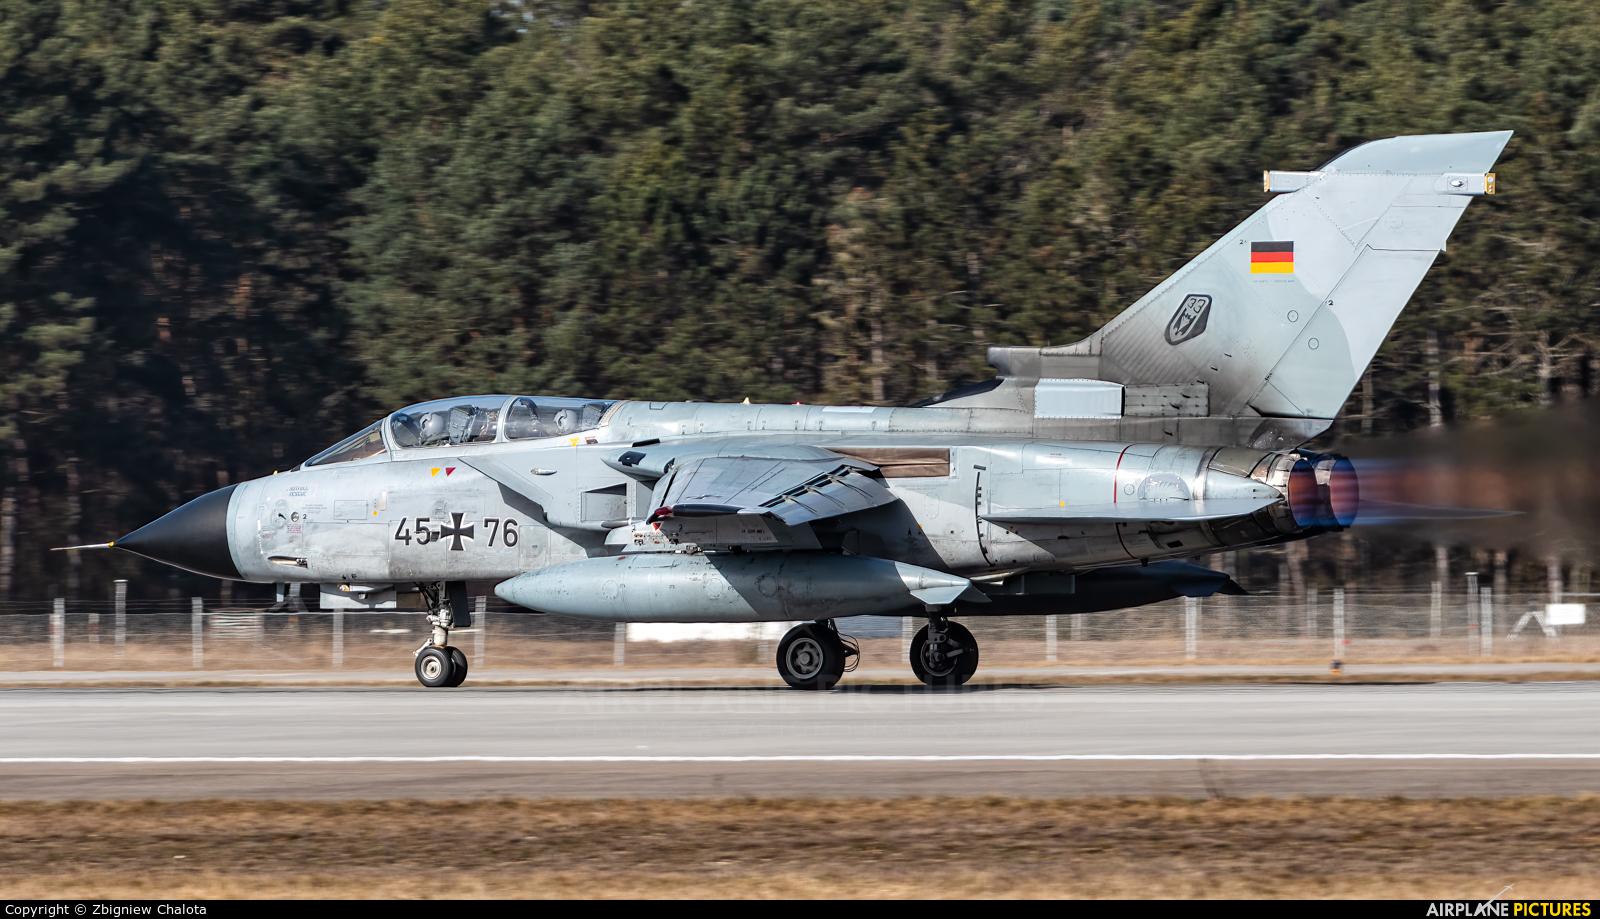 Germany - Air Force 45+76 aircraft at Ingolstadt - Manching